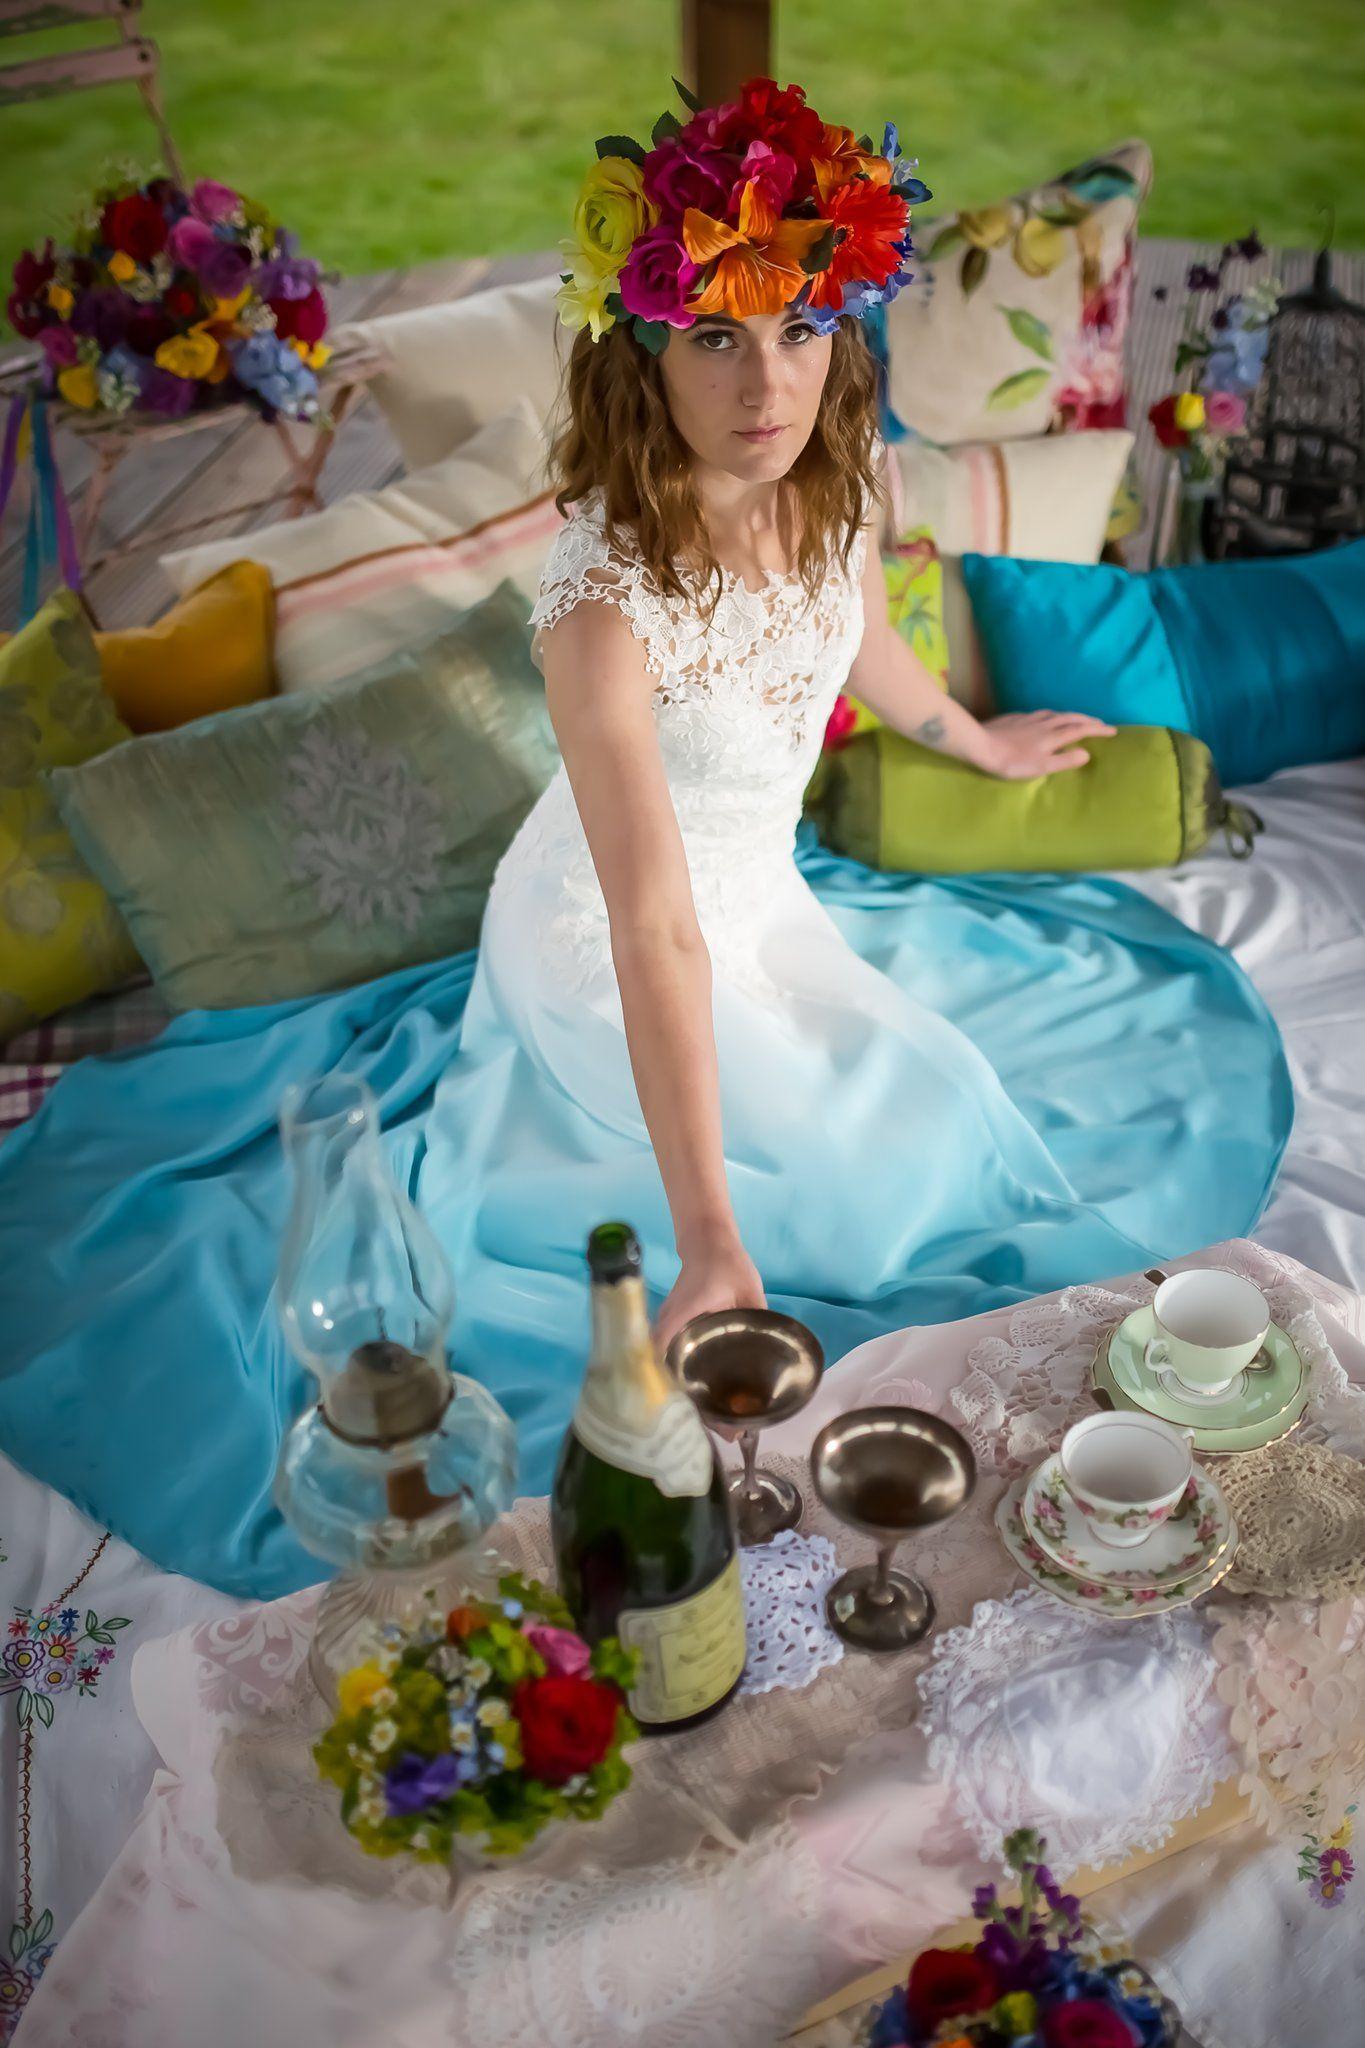 Lucy canut dance wedding dresses wedding dresses pinterest